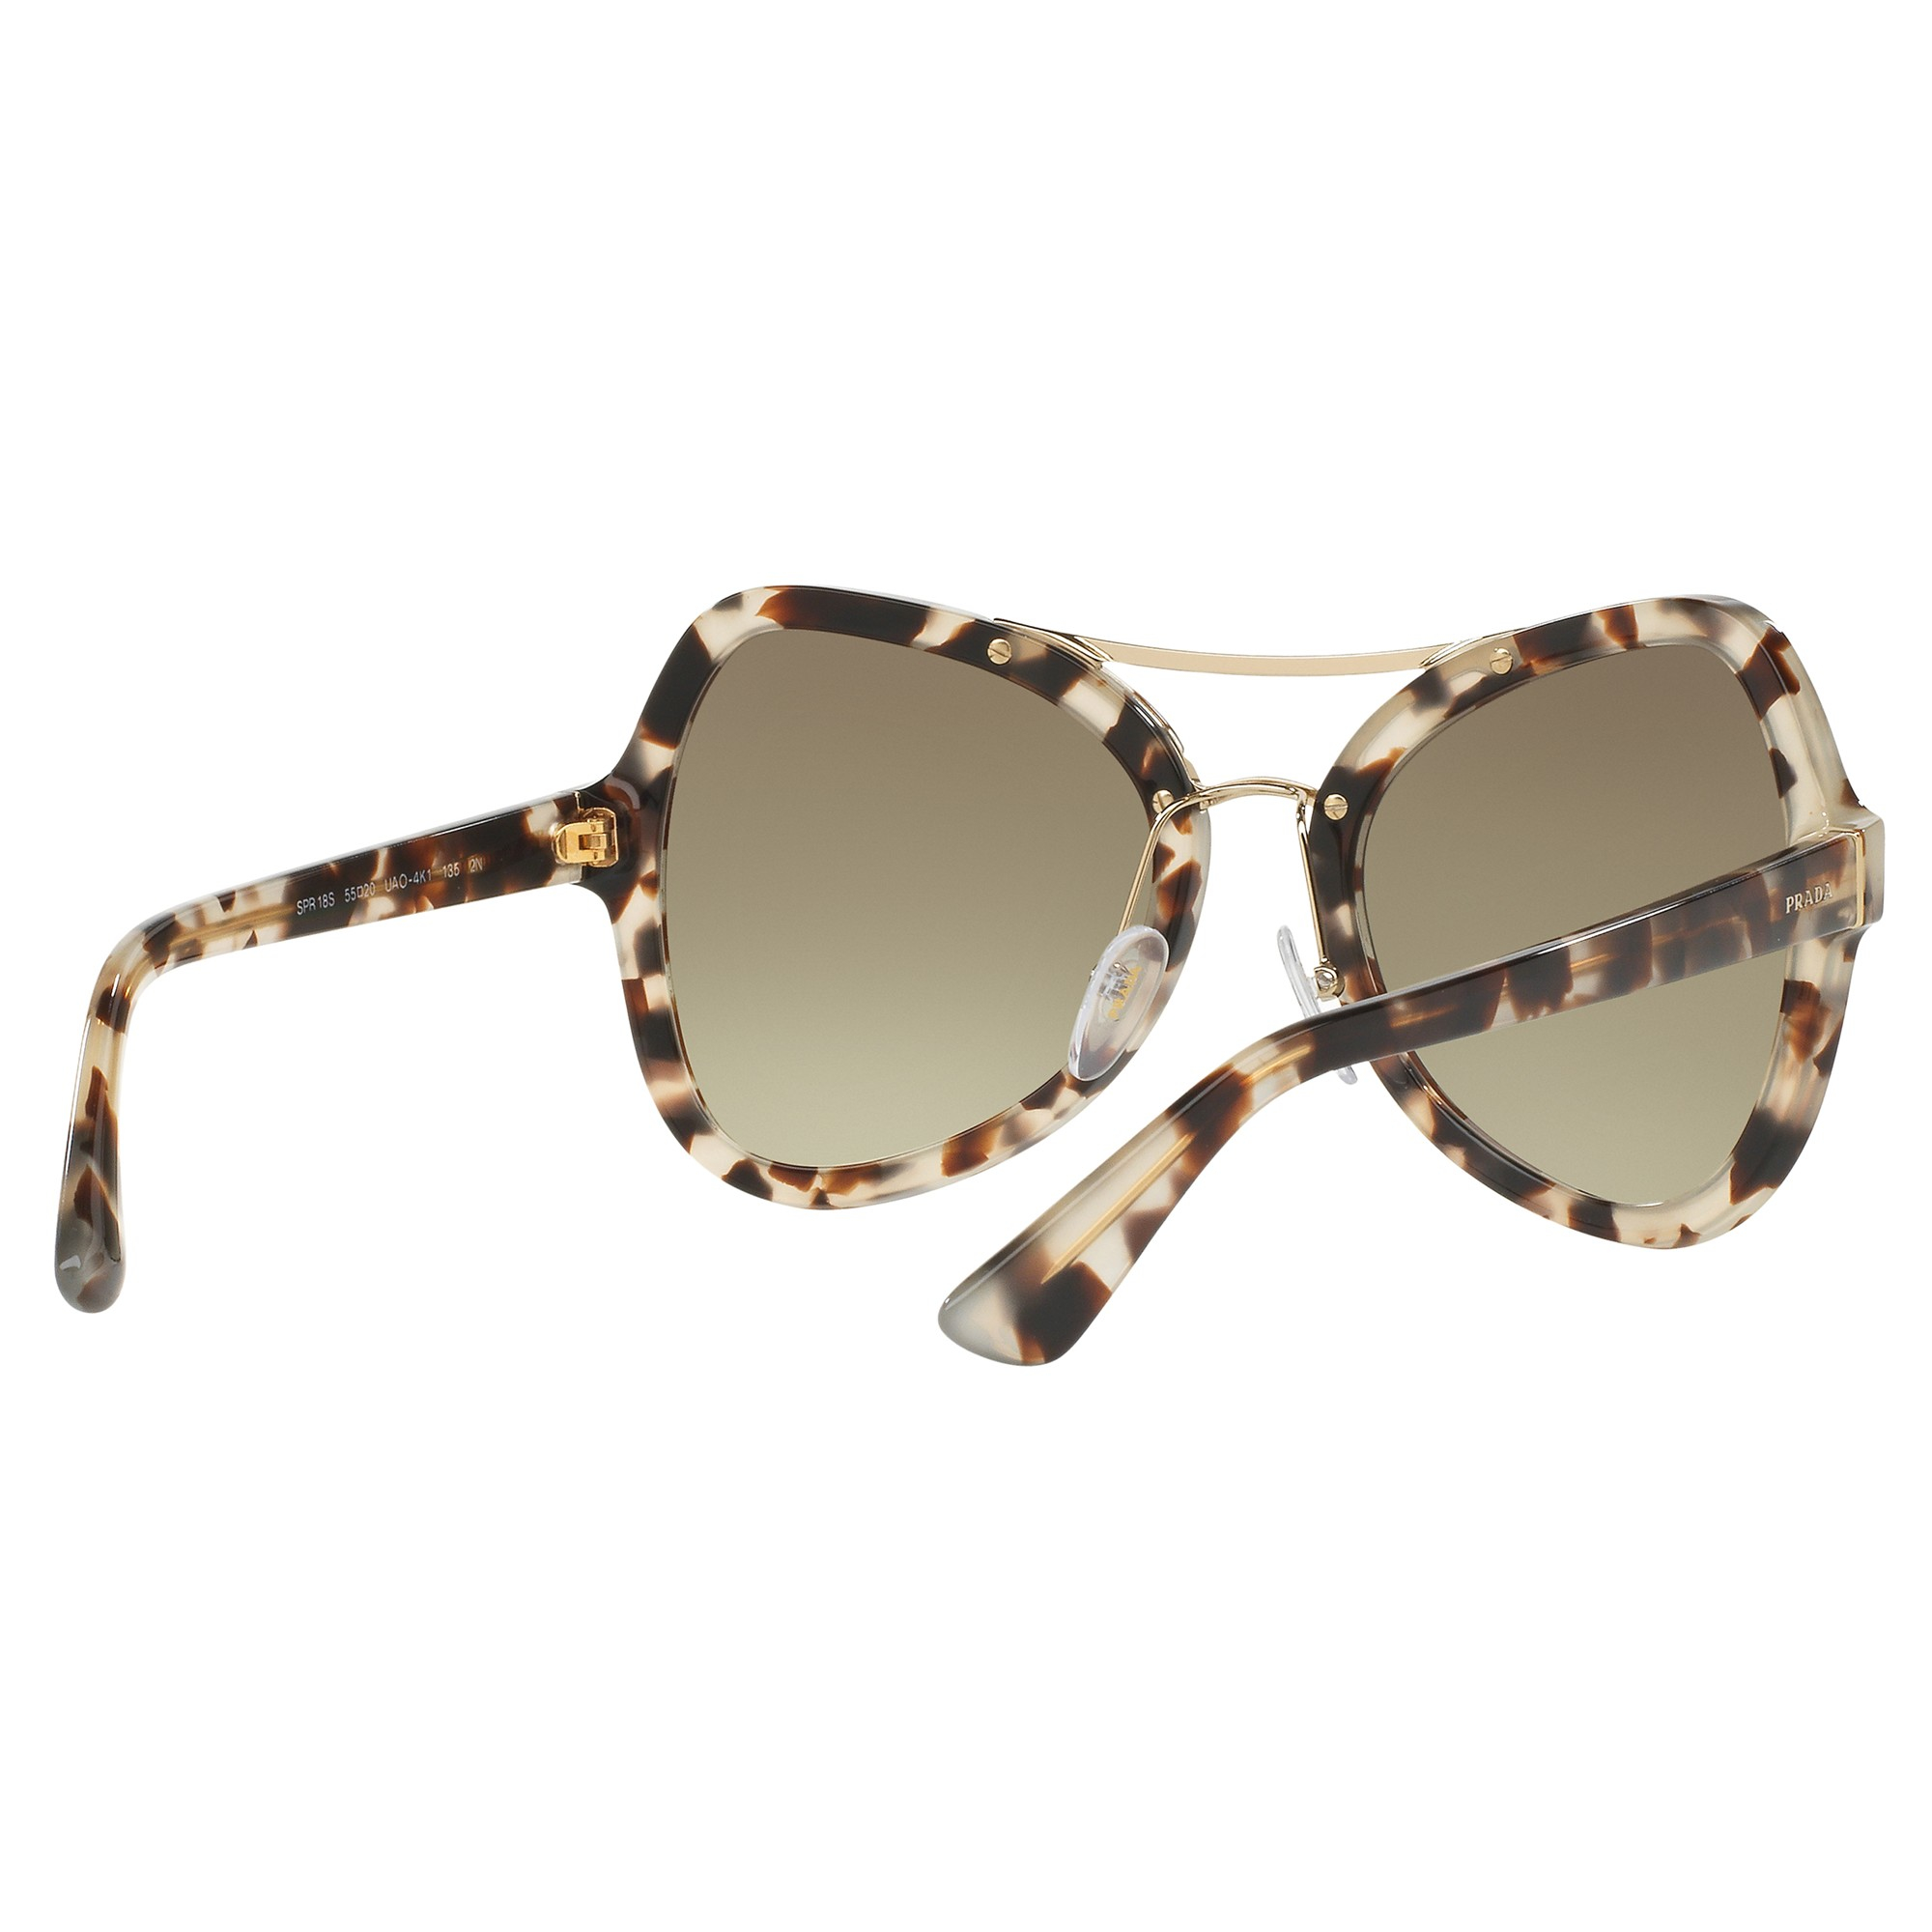 2417588e56 Prada Pr18ss Butterfly Gradient Sunglasses in Green - Lyst